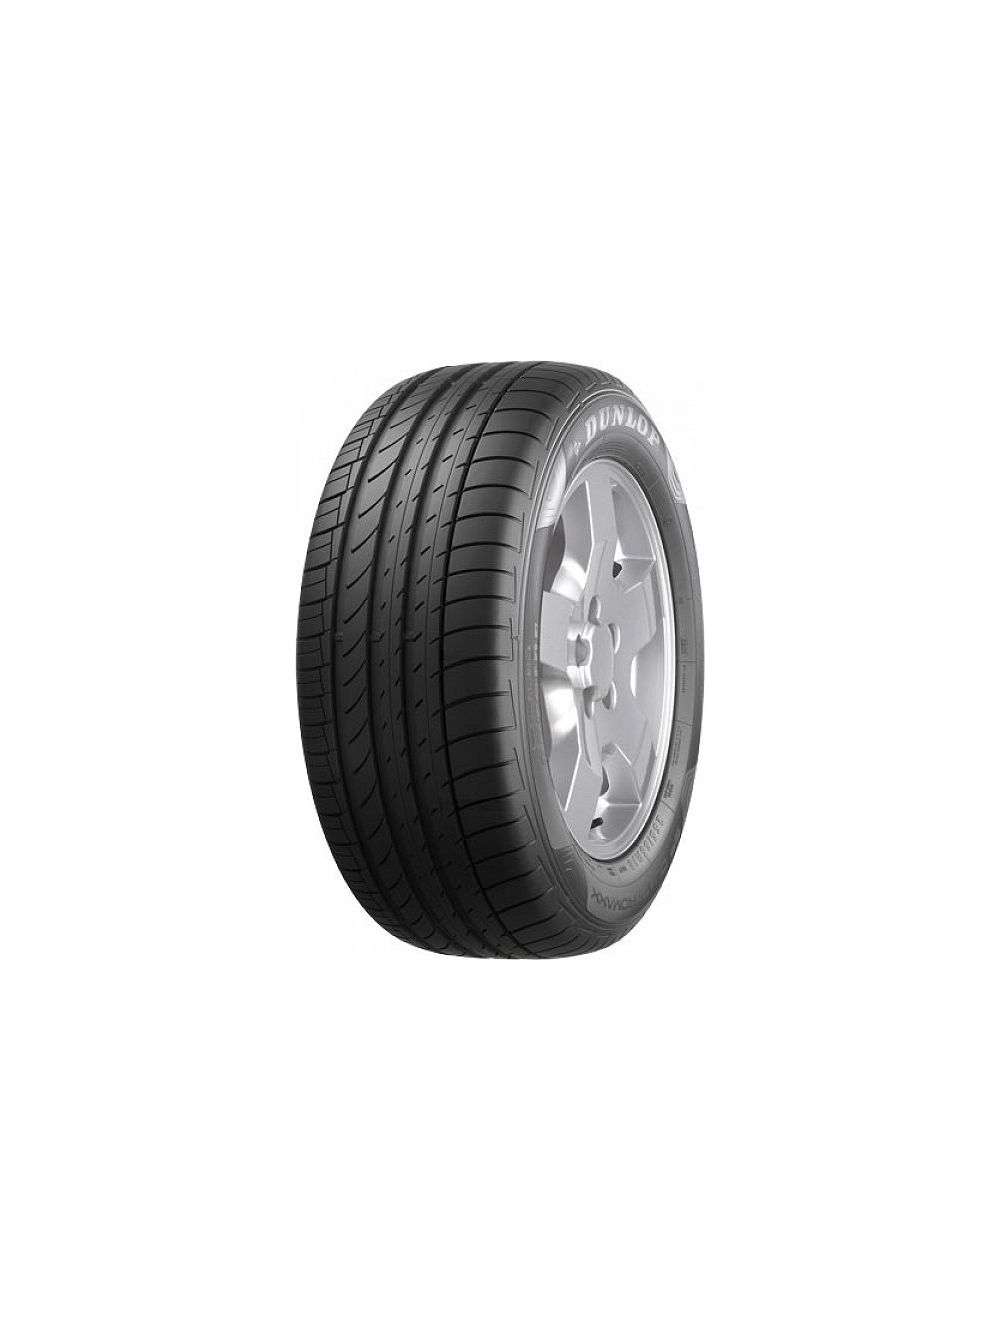 Dunlop 255/35R20 Y QuattroMaxx XL RO1 Nyári gumi